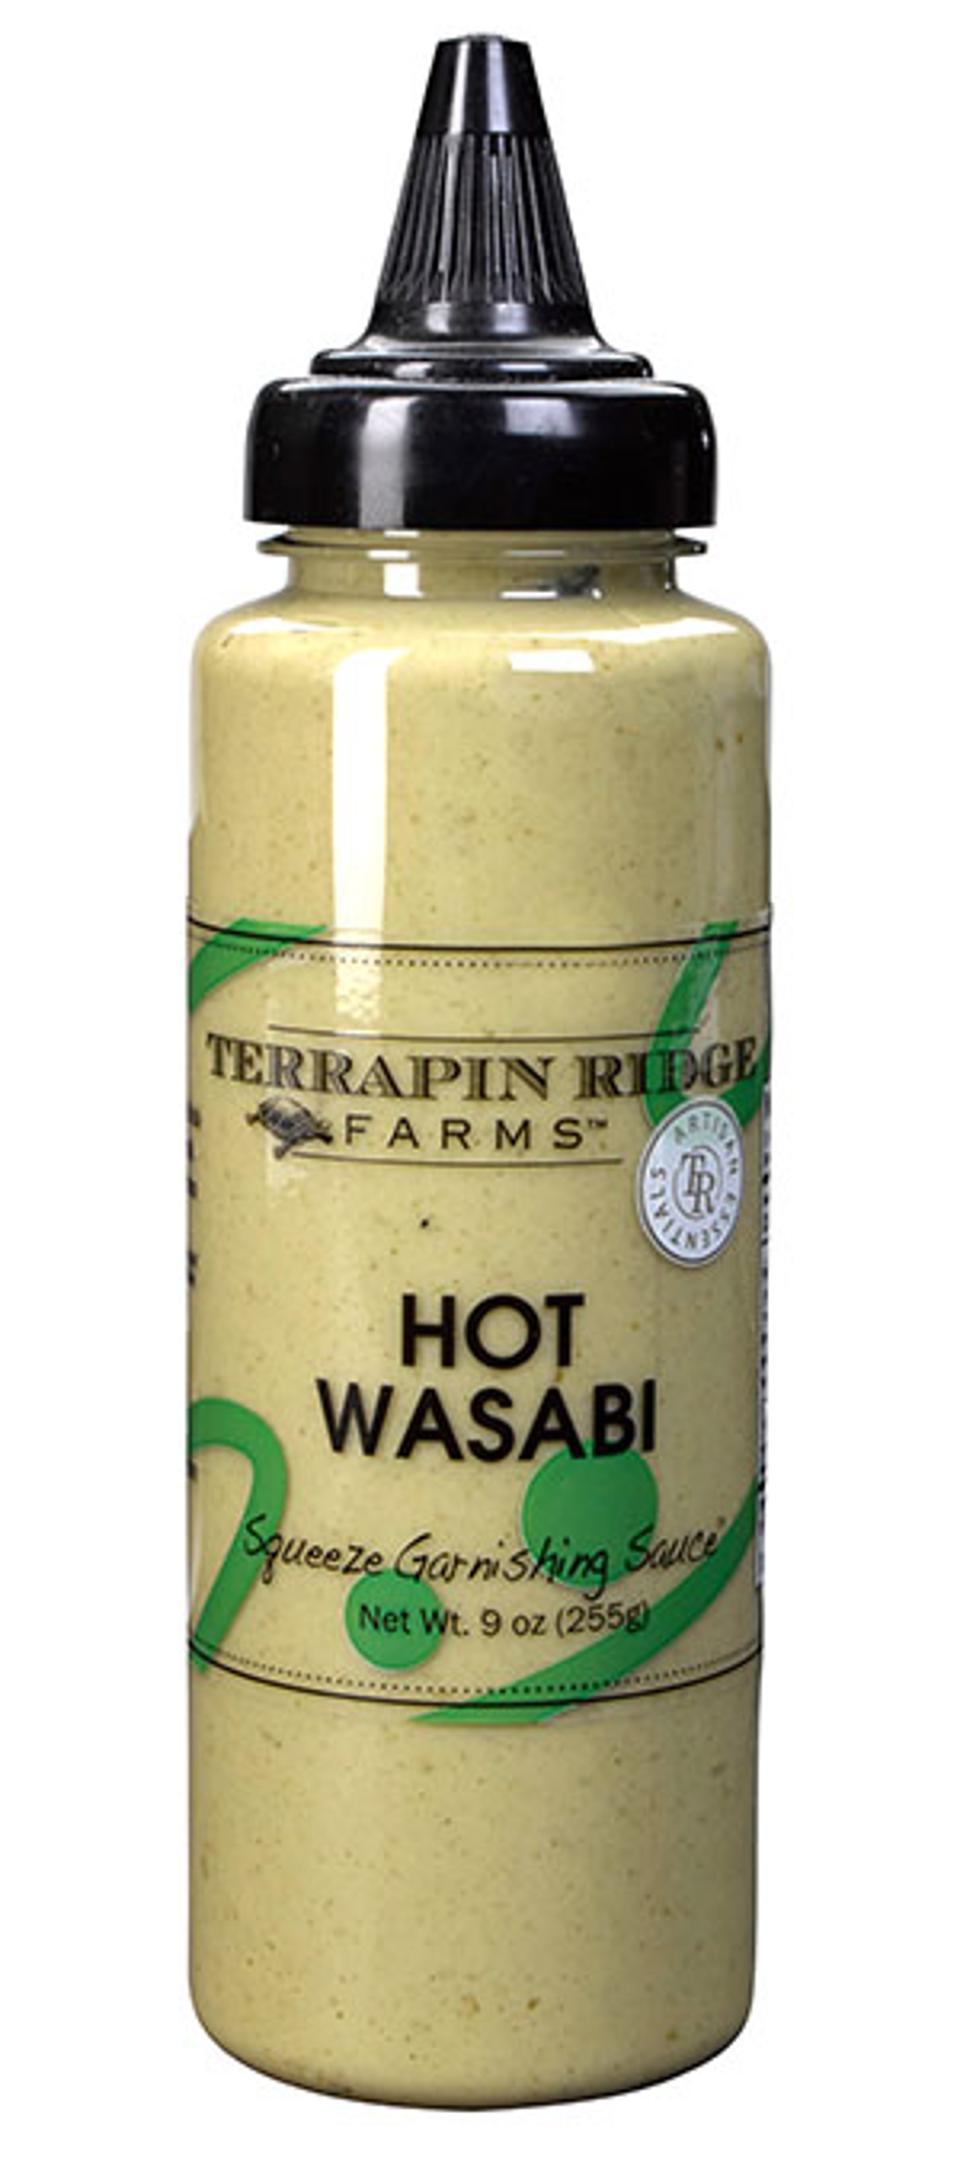 Squeeze de garniture au wasabi chaud